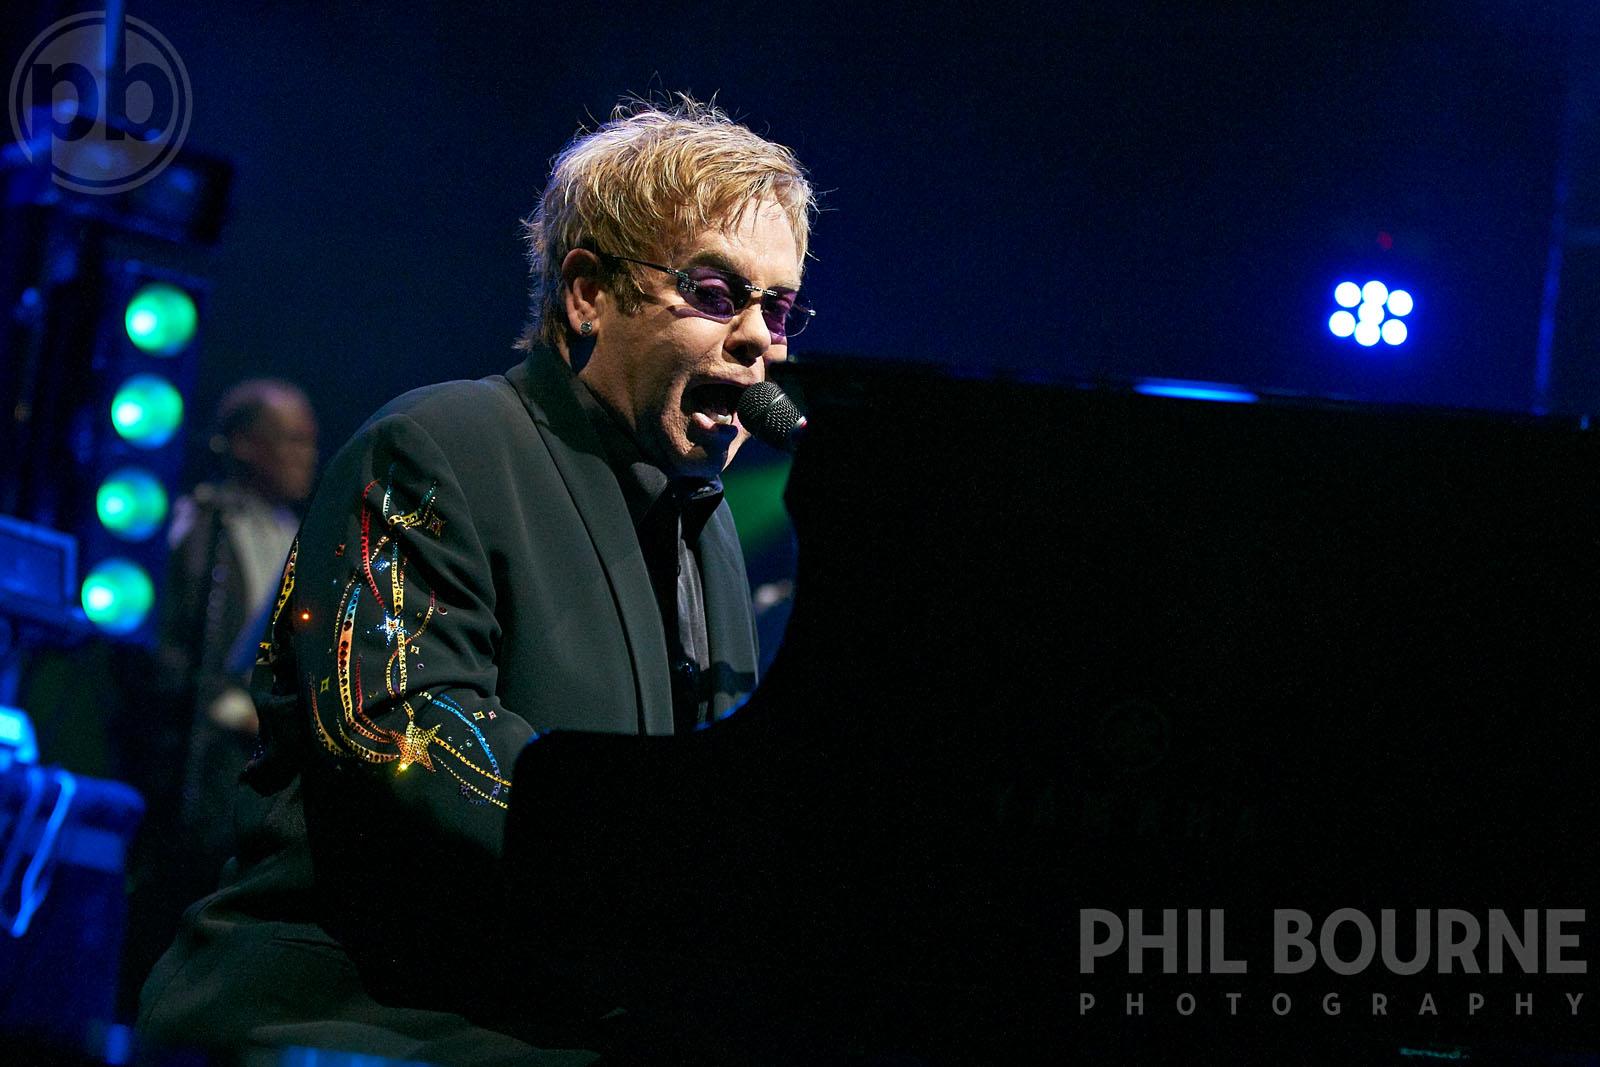 052_Live_Music_Photographer_London_Elton_John_001.jpg